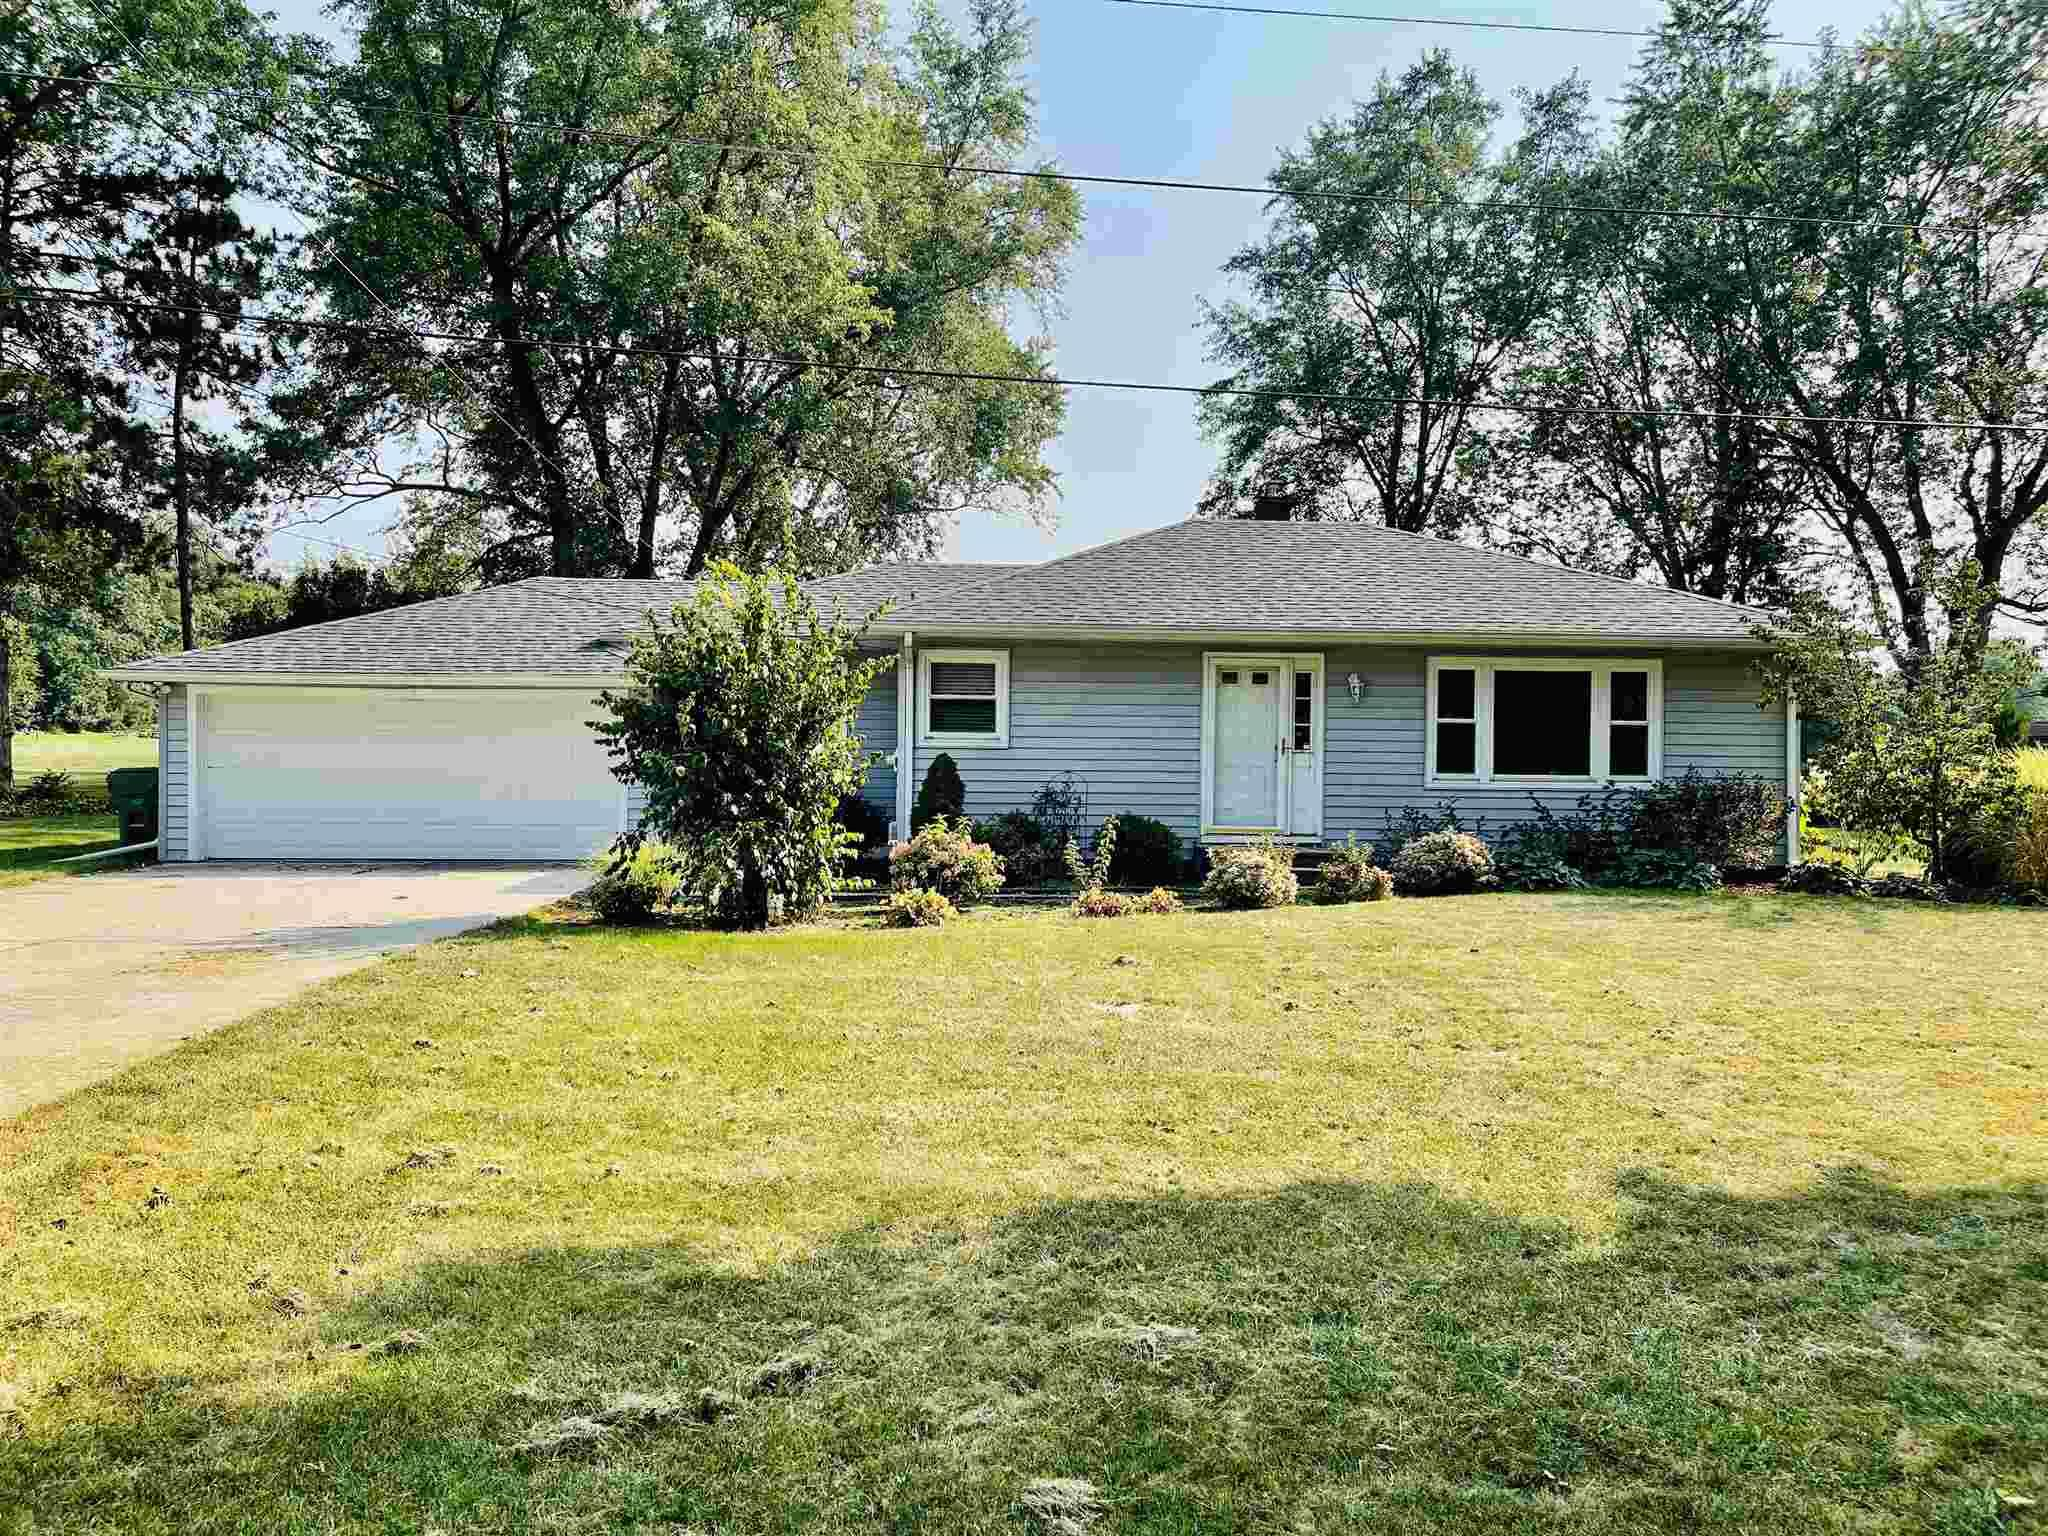 28942 County Road Elkhart, IN 46517